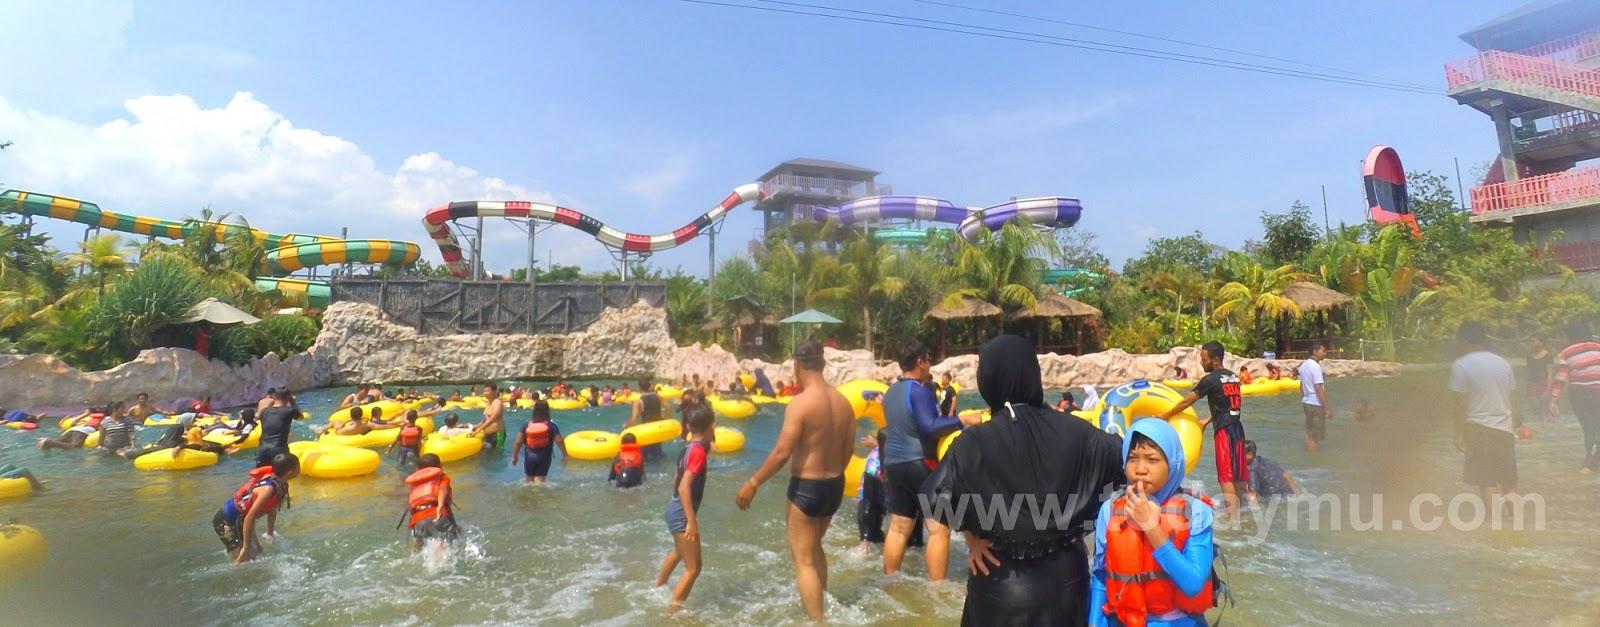 Menikmati Serunya JogjaBay Pirates Adventure Waterpark